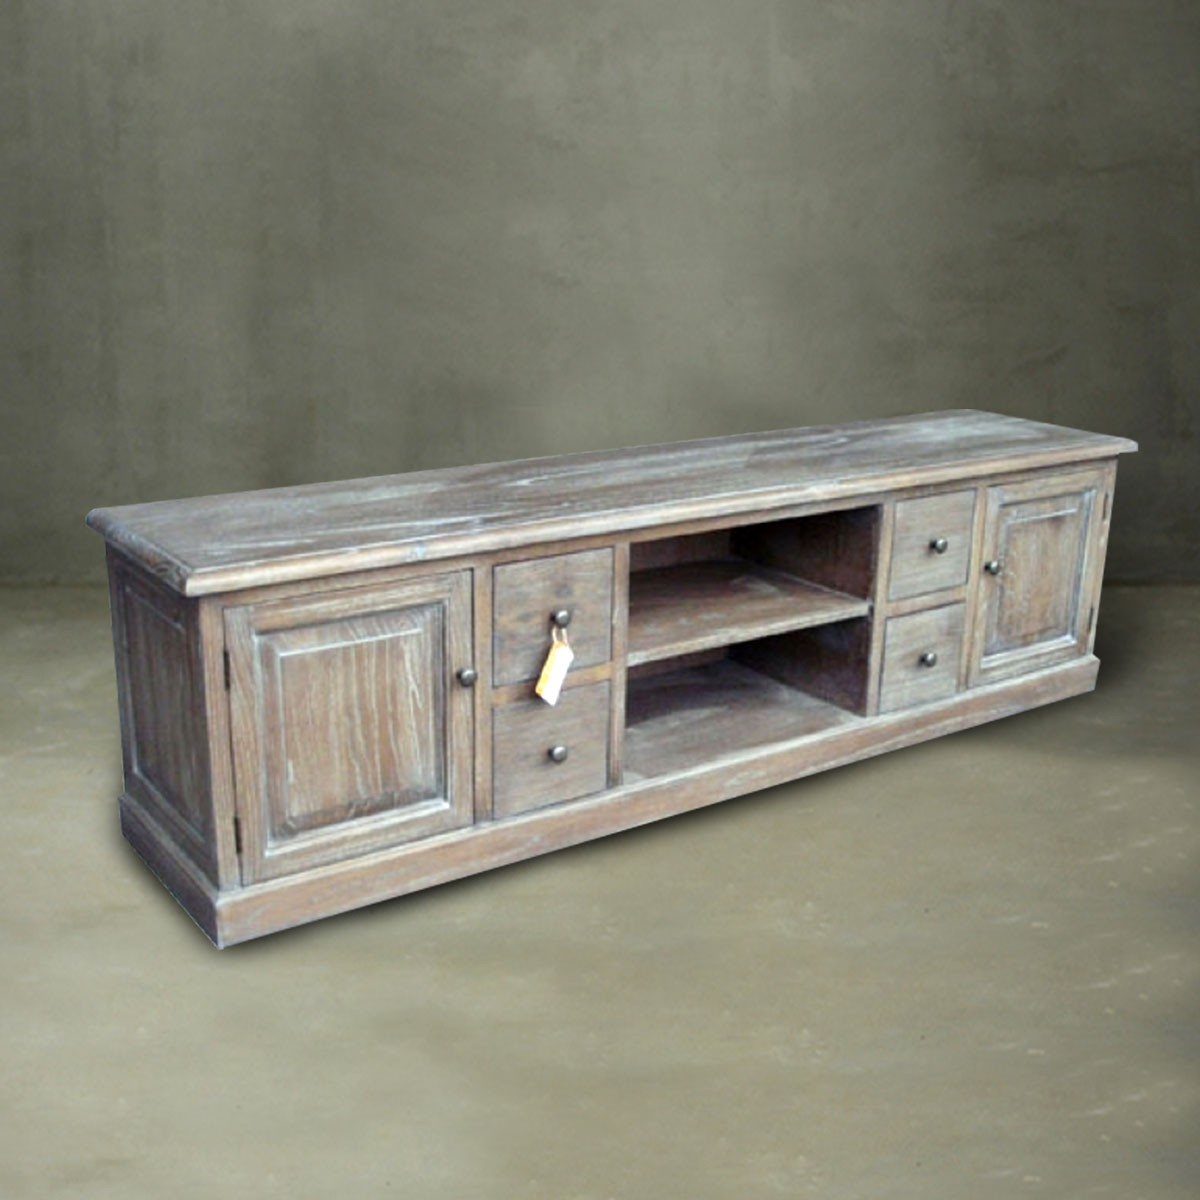 72.0u201cW Solid Wood Media Cabinet (PJG016)